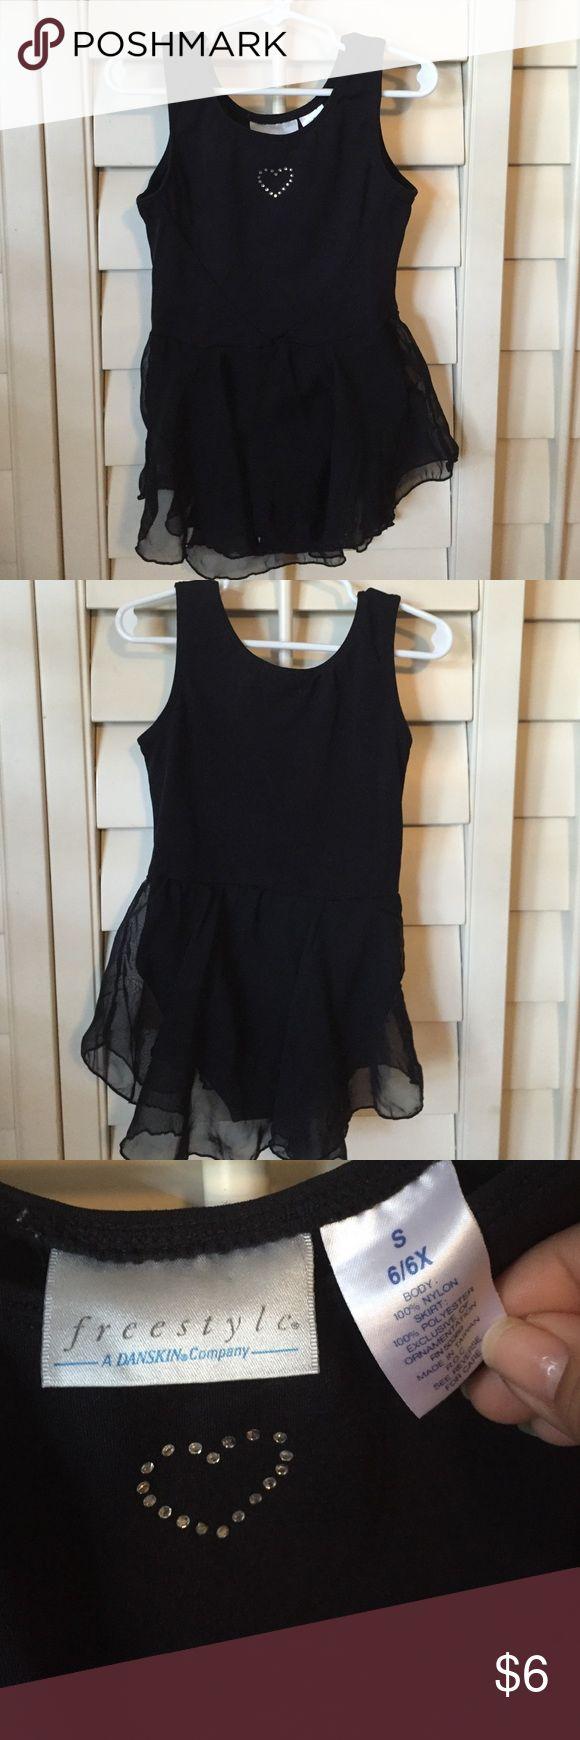 Black dance leotard Cute black leotard with skirt attached. Other